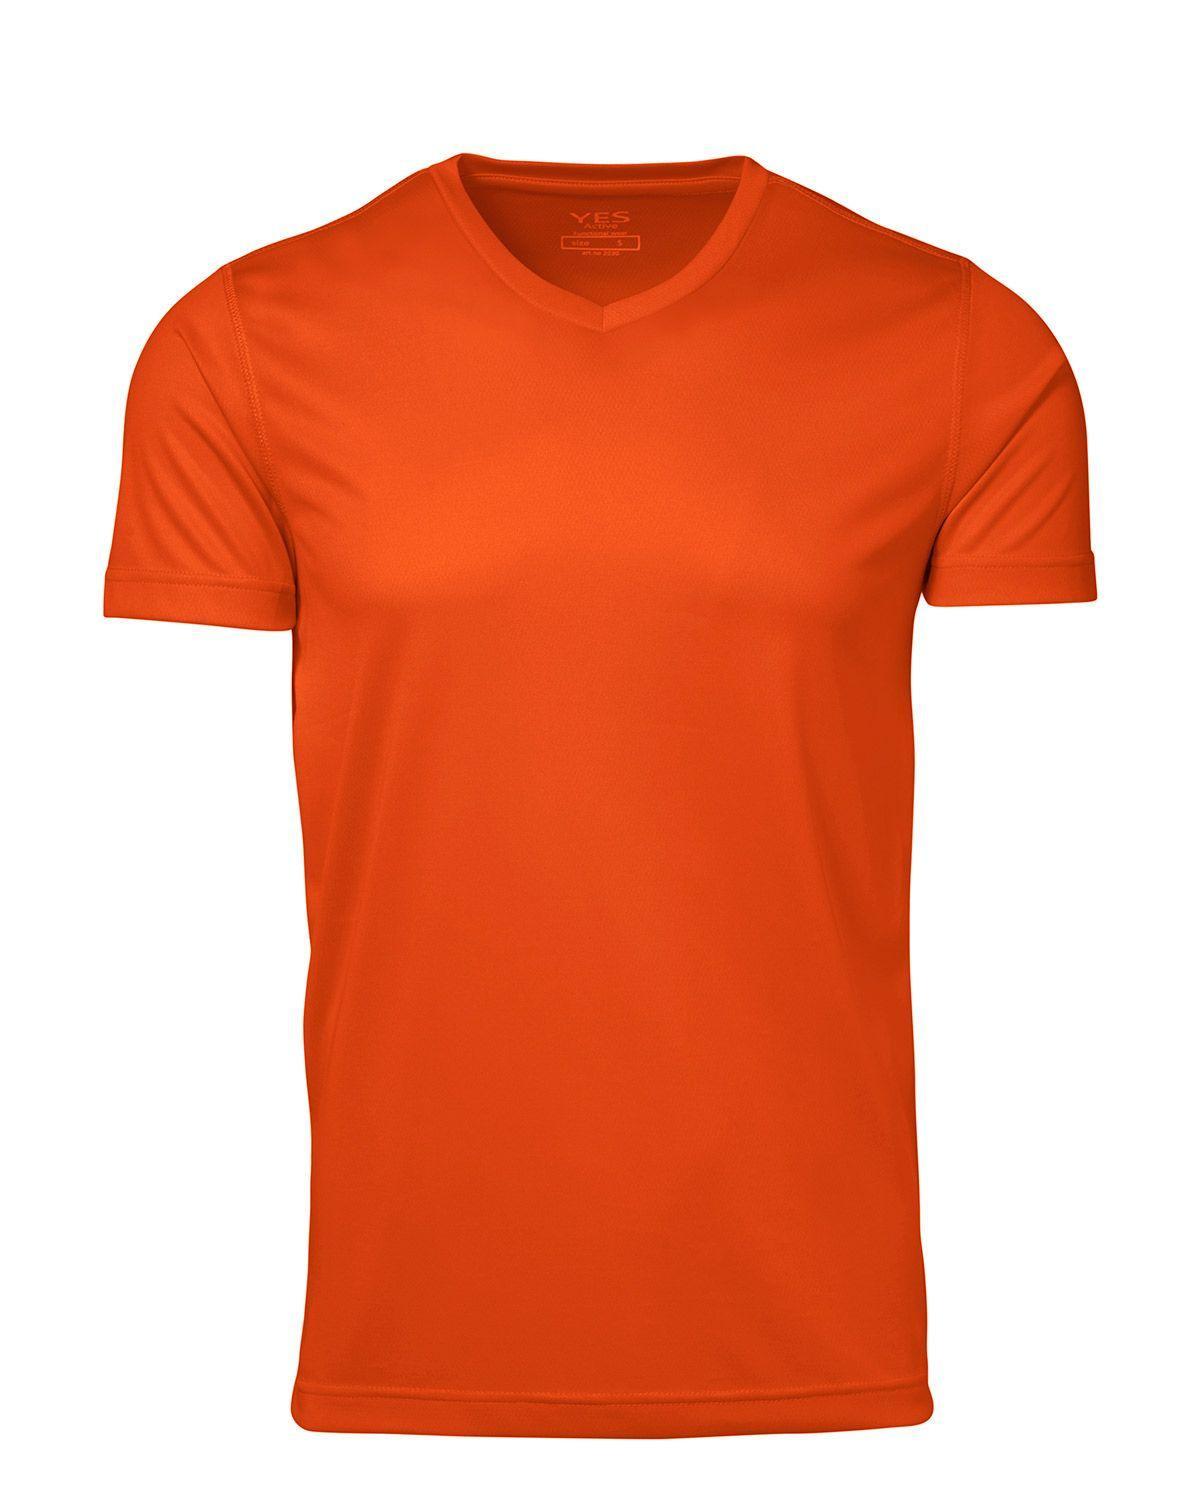 ID YES Svedtransporterende T-shirt (Orange, 2XL)